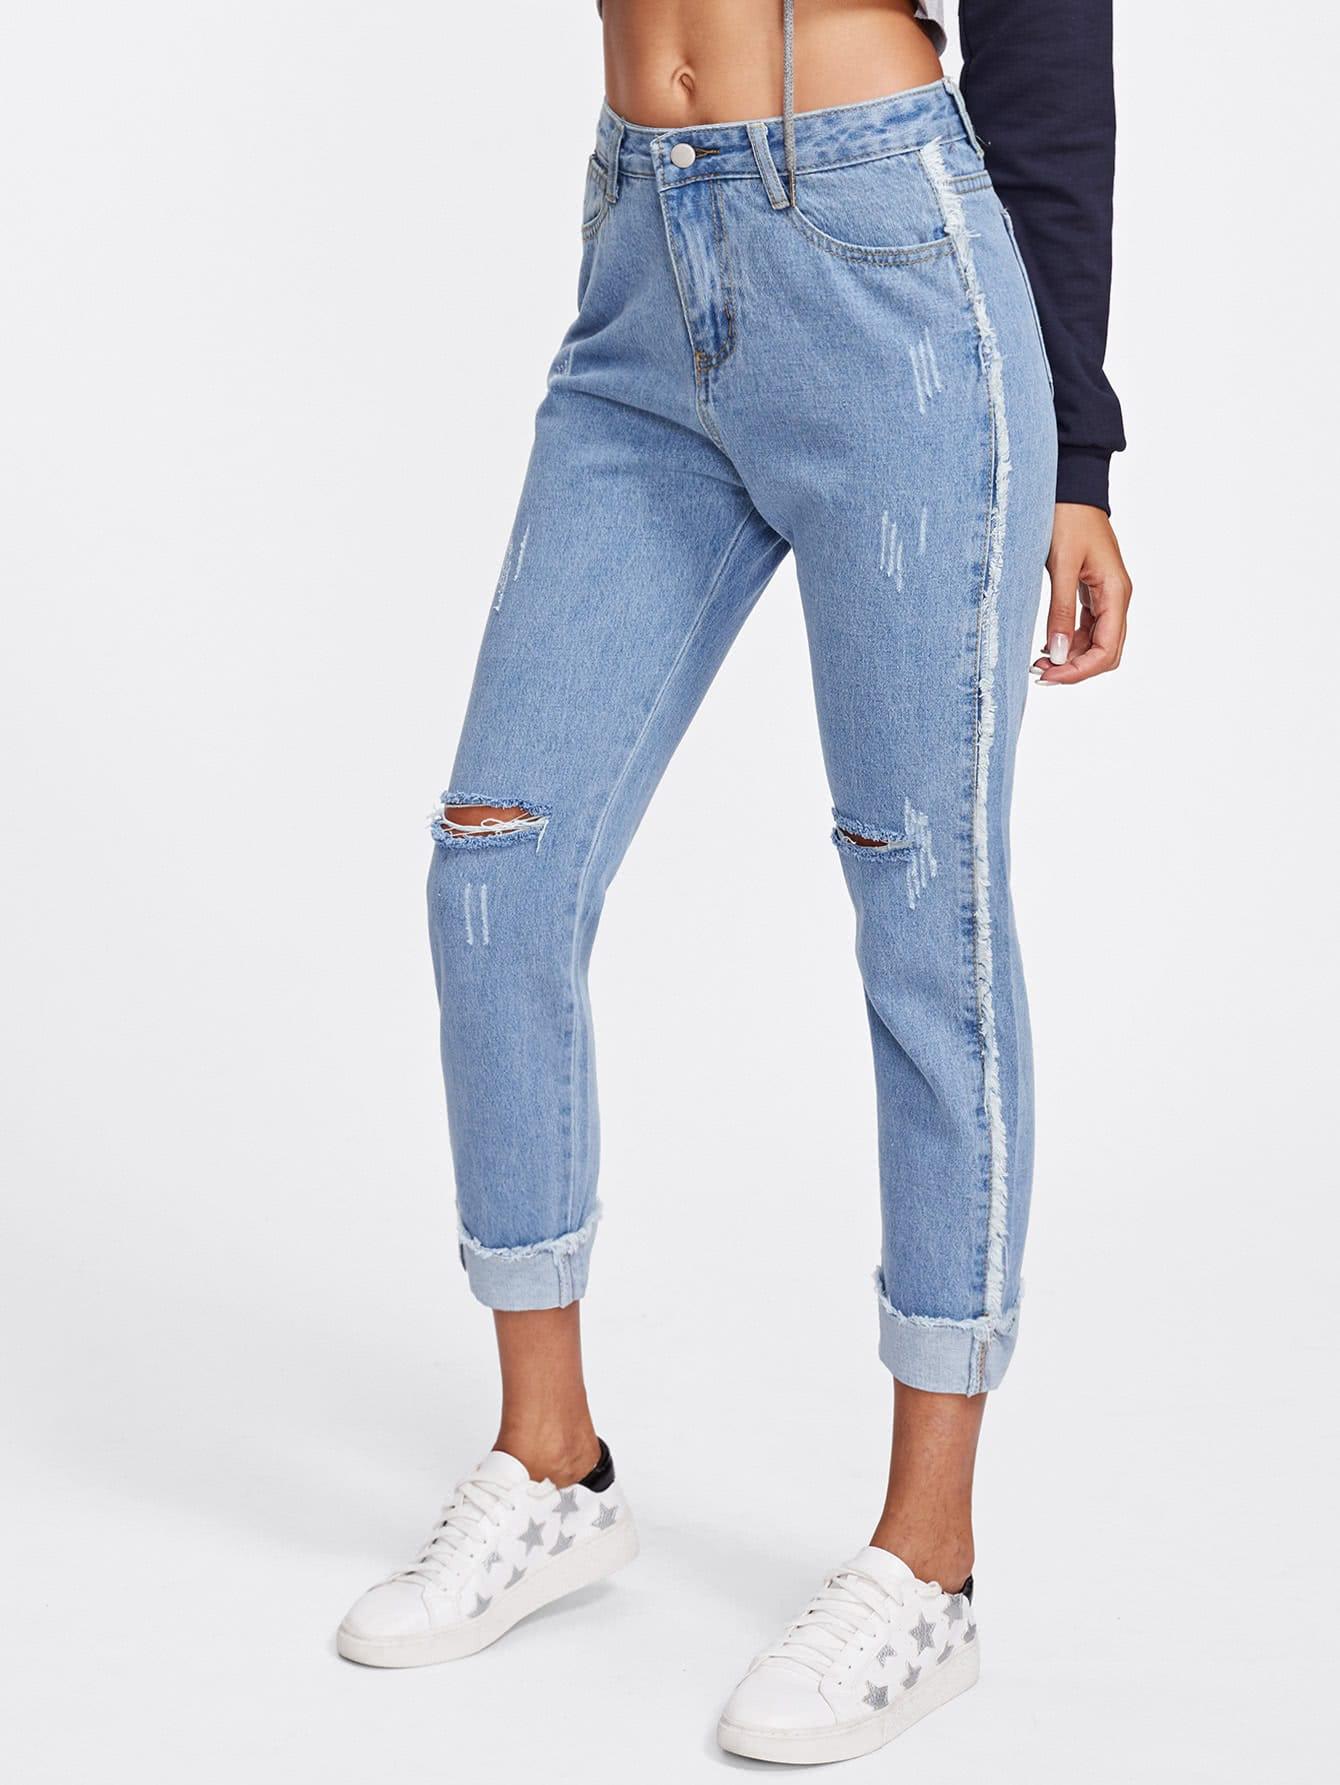 Knee Rips Rolled Hem Jeans solid rolled hem pants